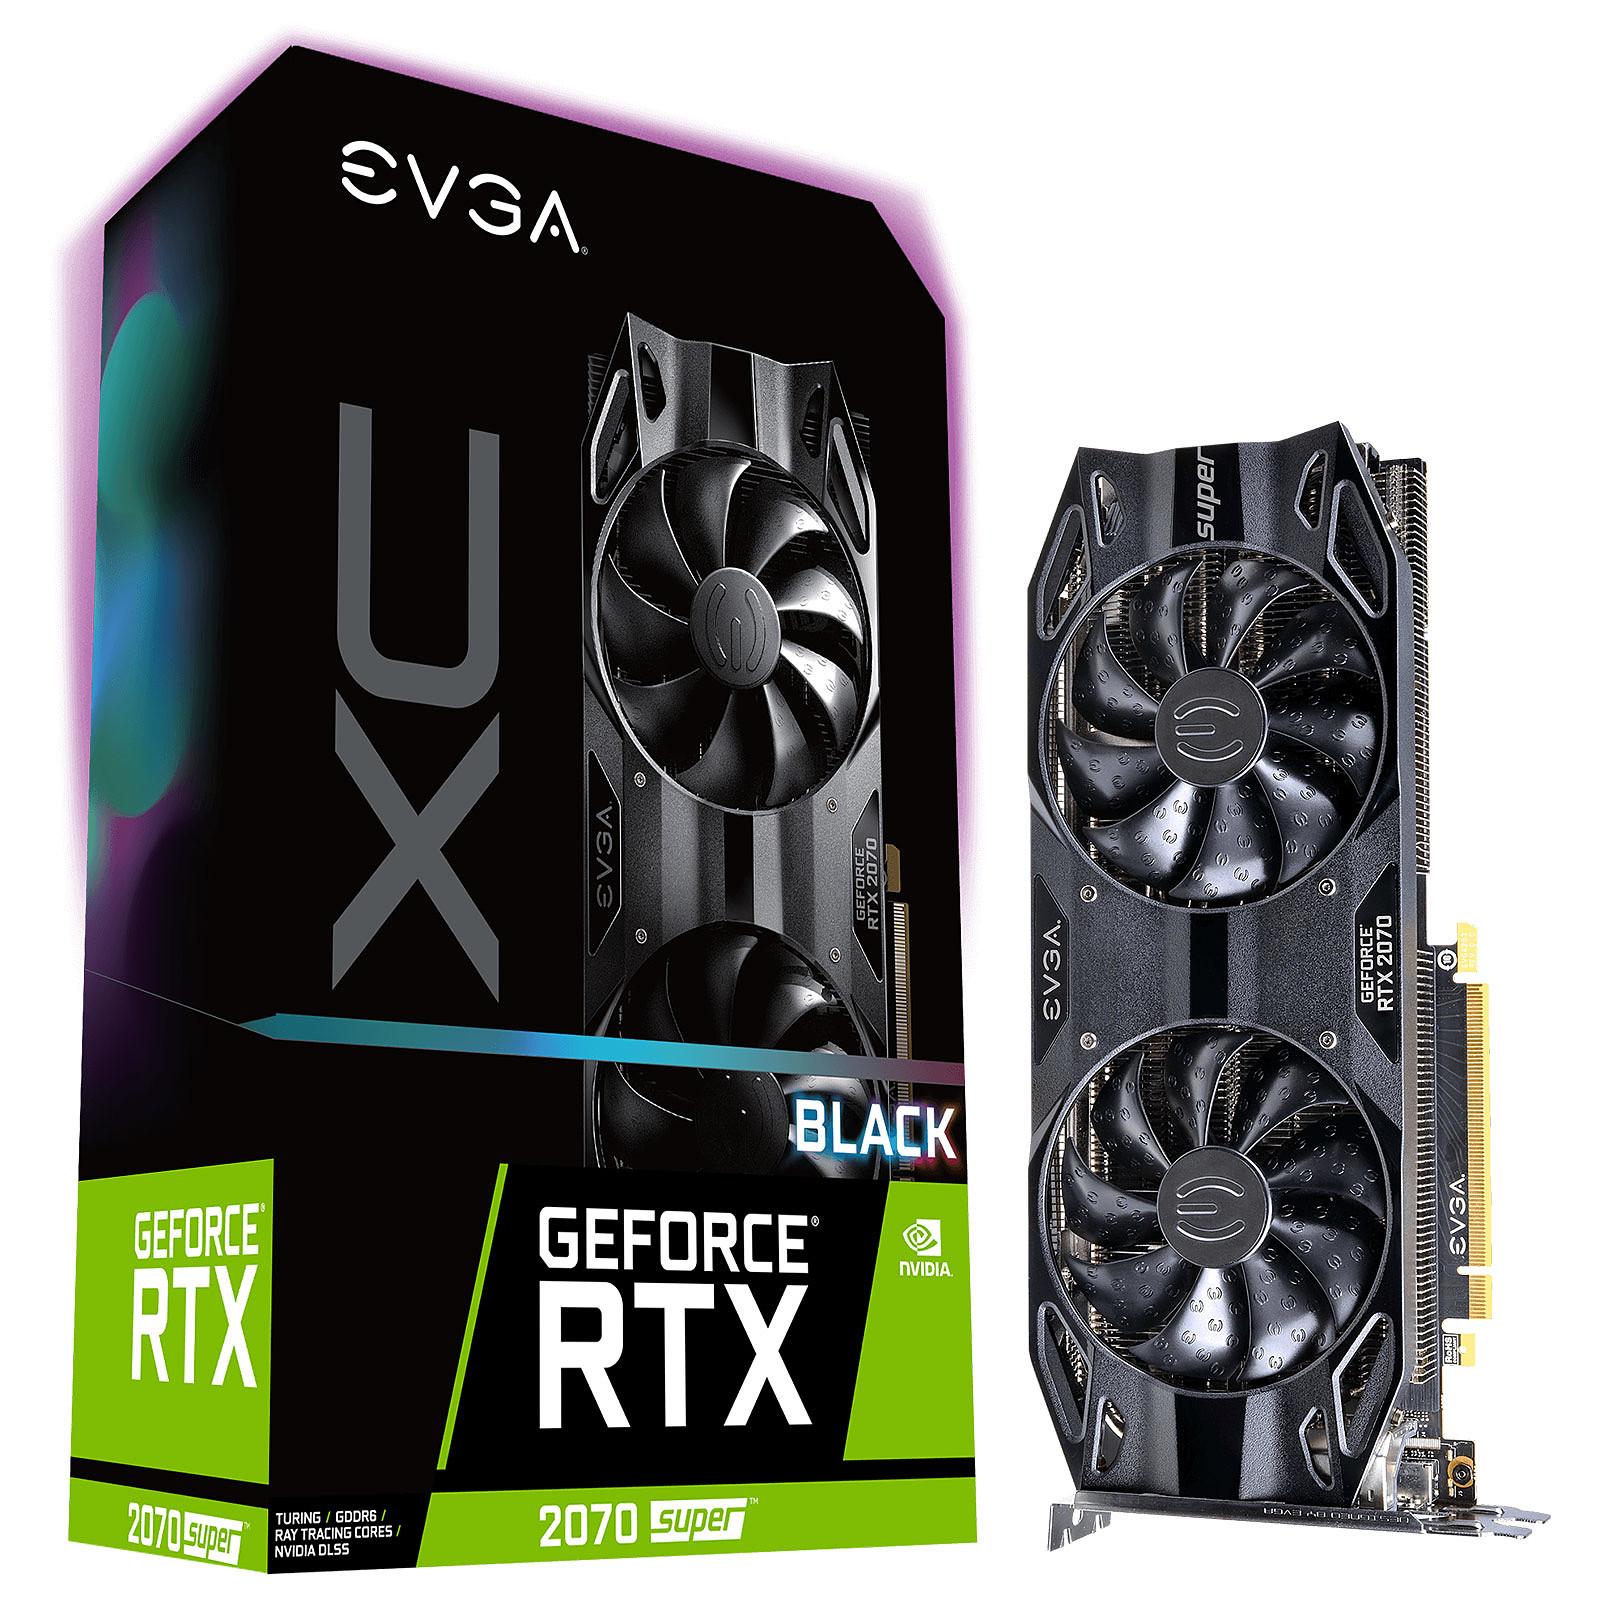 EVGA GeForce RTX 2070 SUPER BLACK GAMING